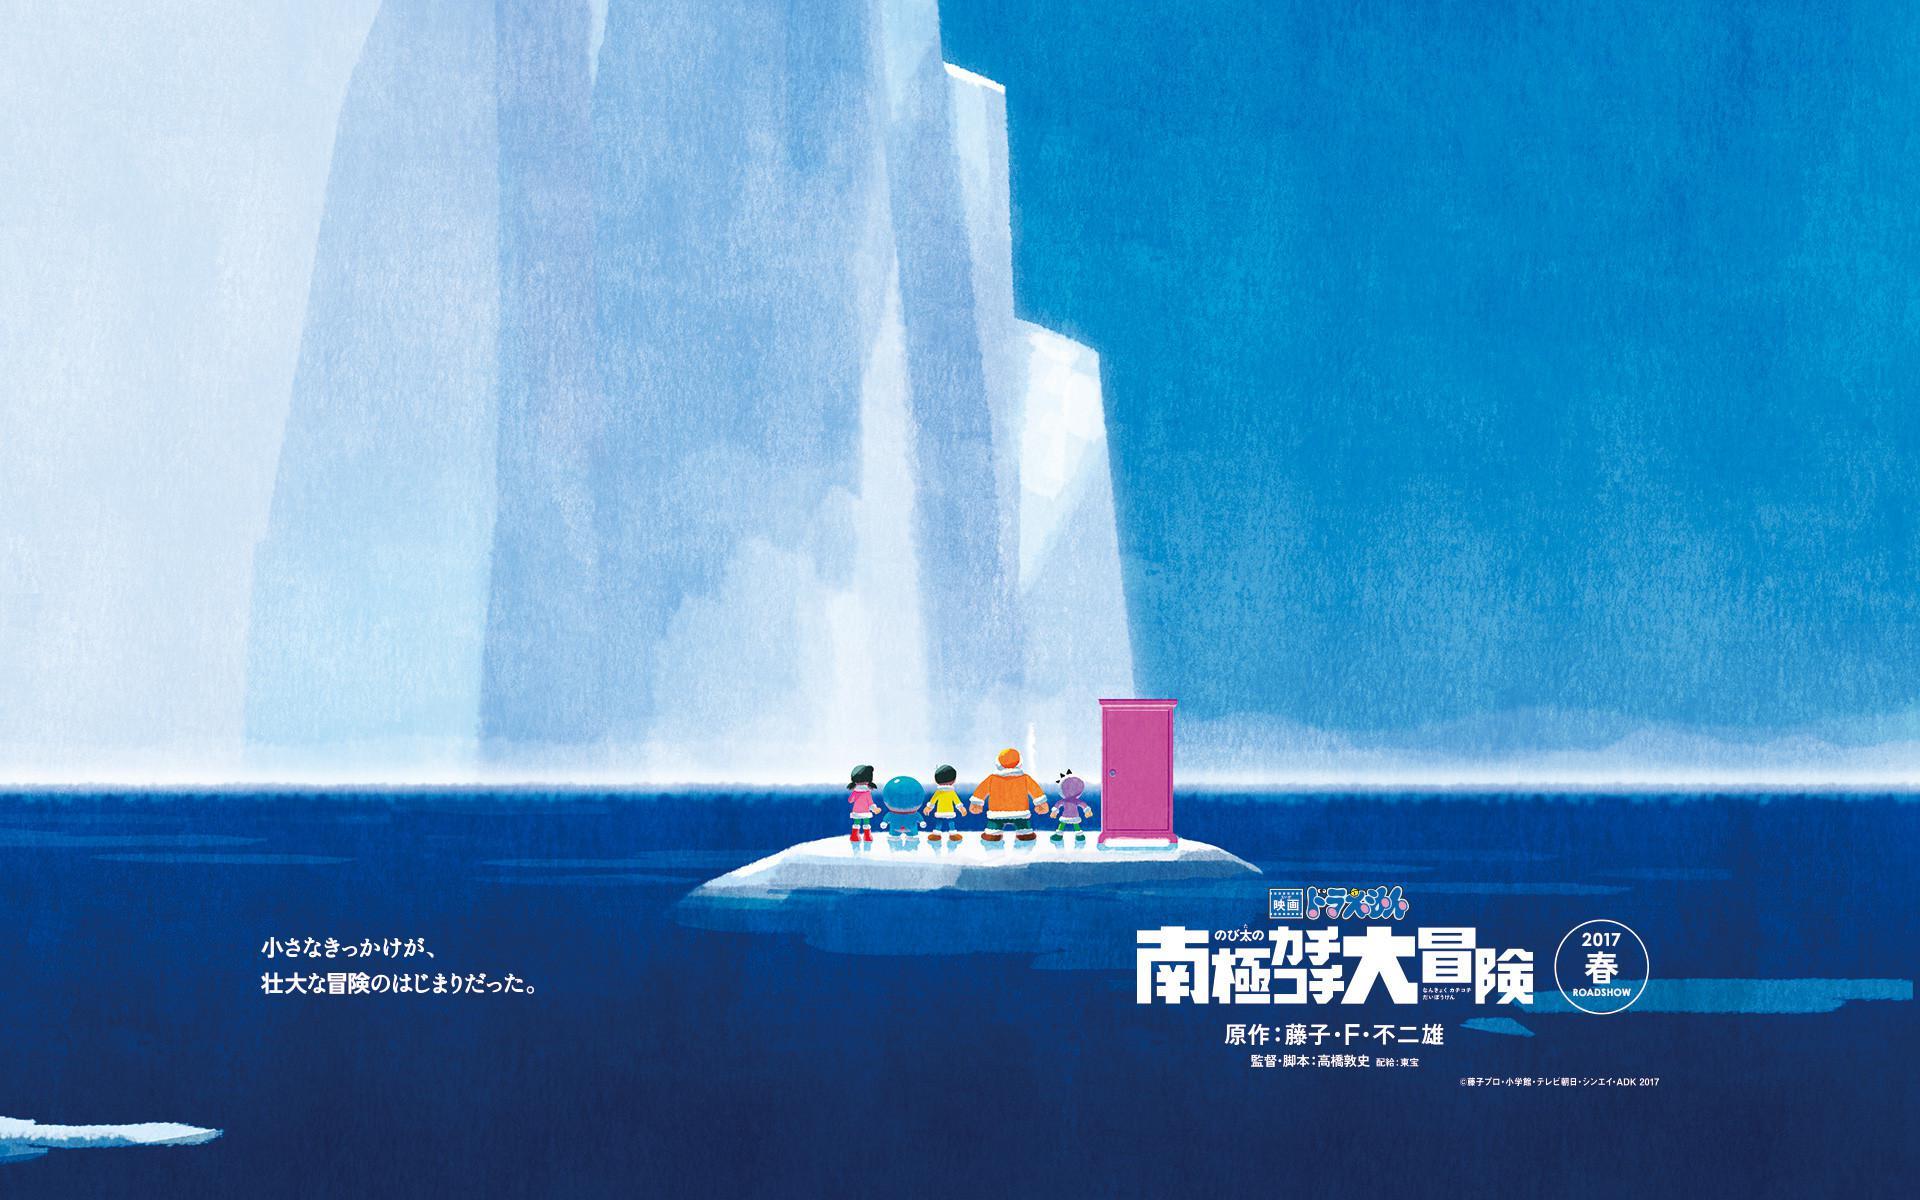 Film Doraemon ke-37, Doraemon the Movie 2017: Great Adventure in the Antarctic Kachi Kochi. (Shin-Ei Animation)